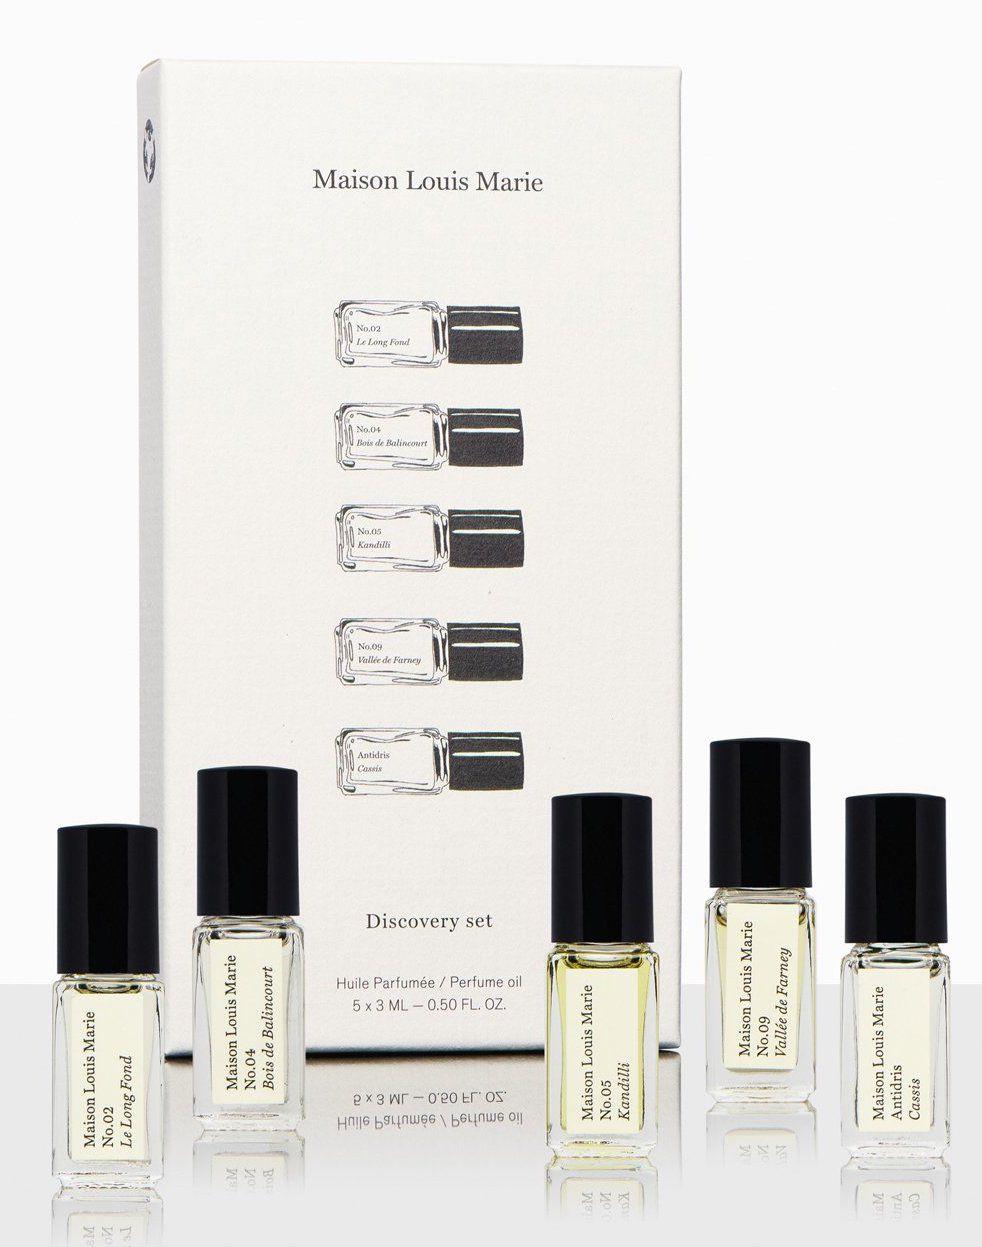 Maison Louis Marie Perfume Oil Discovery Set